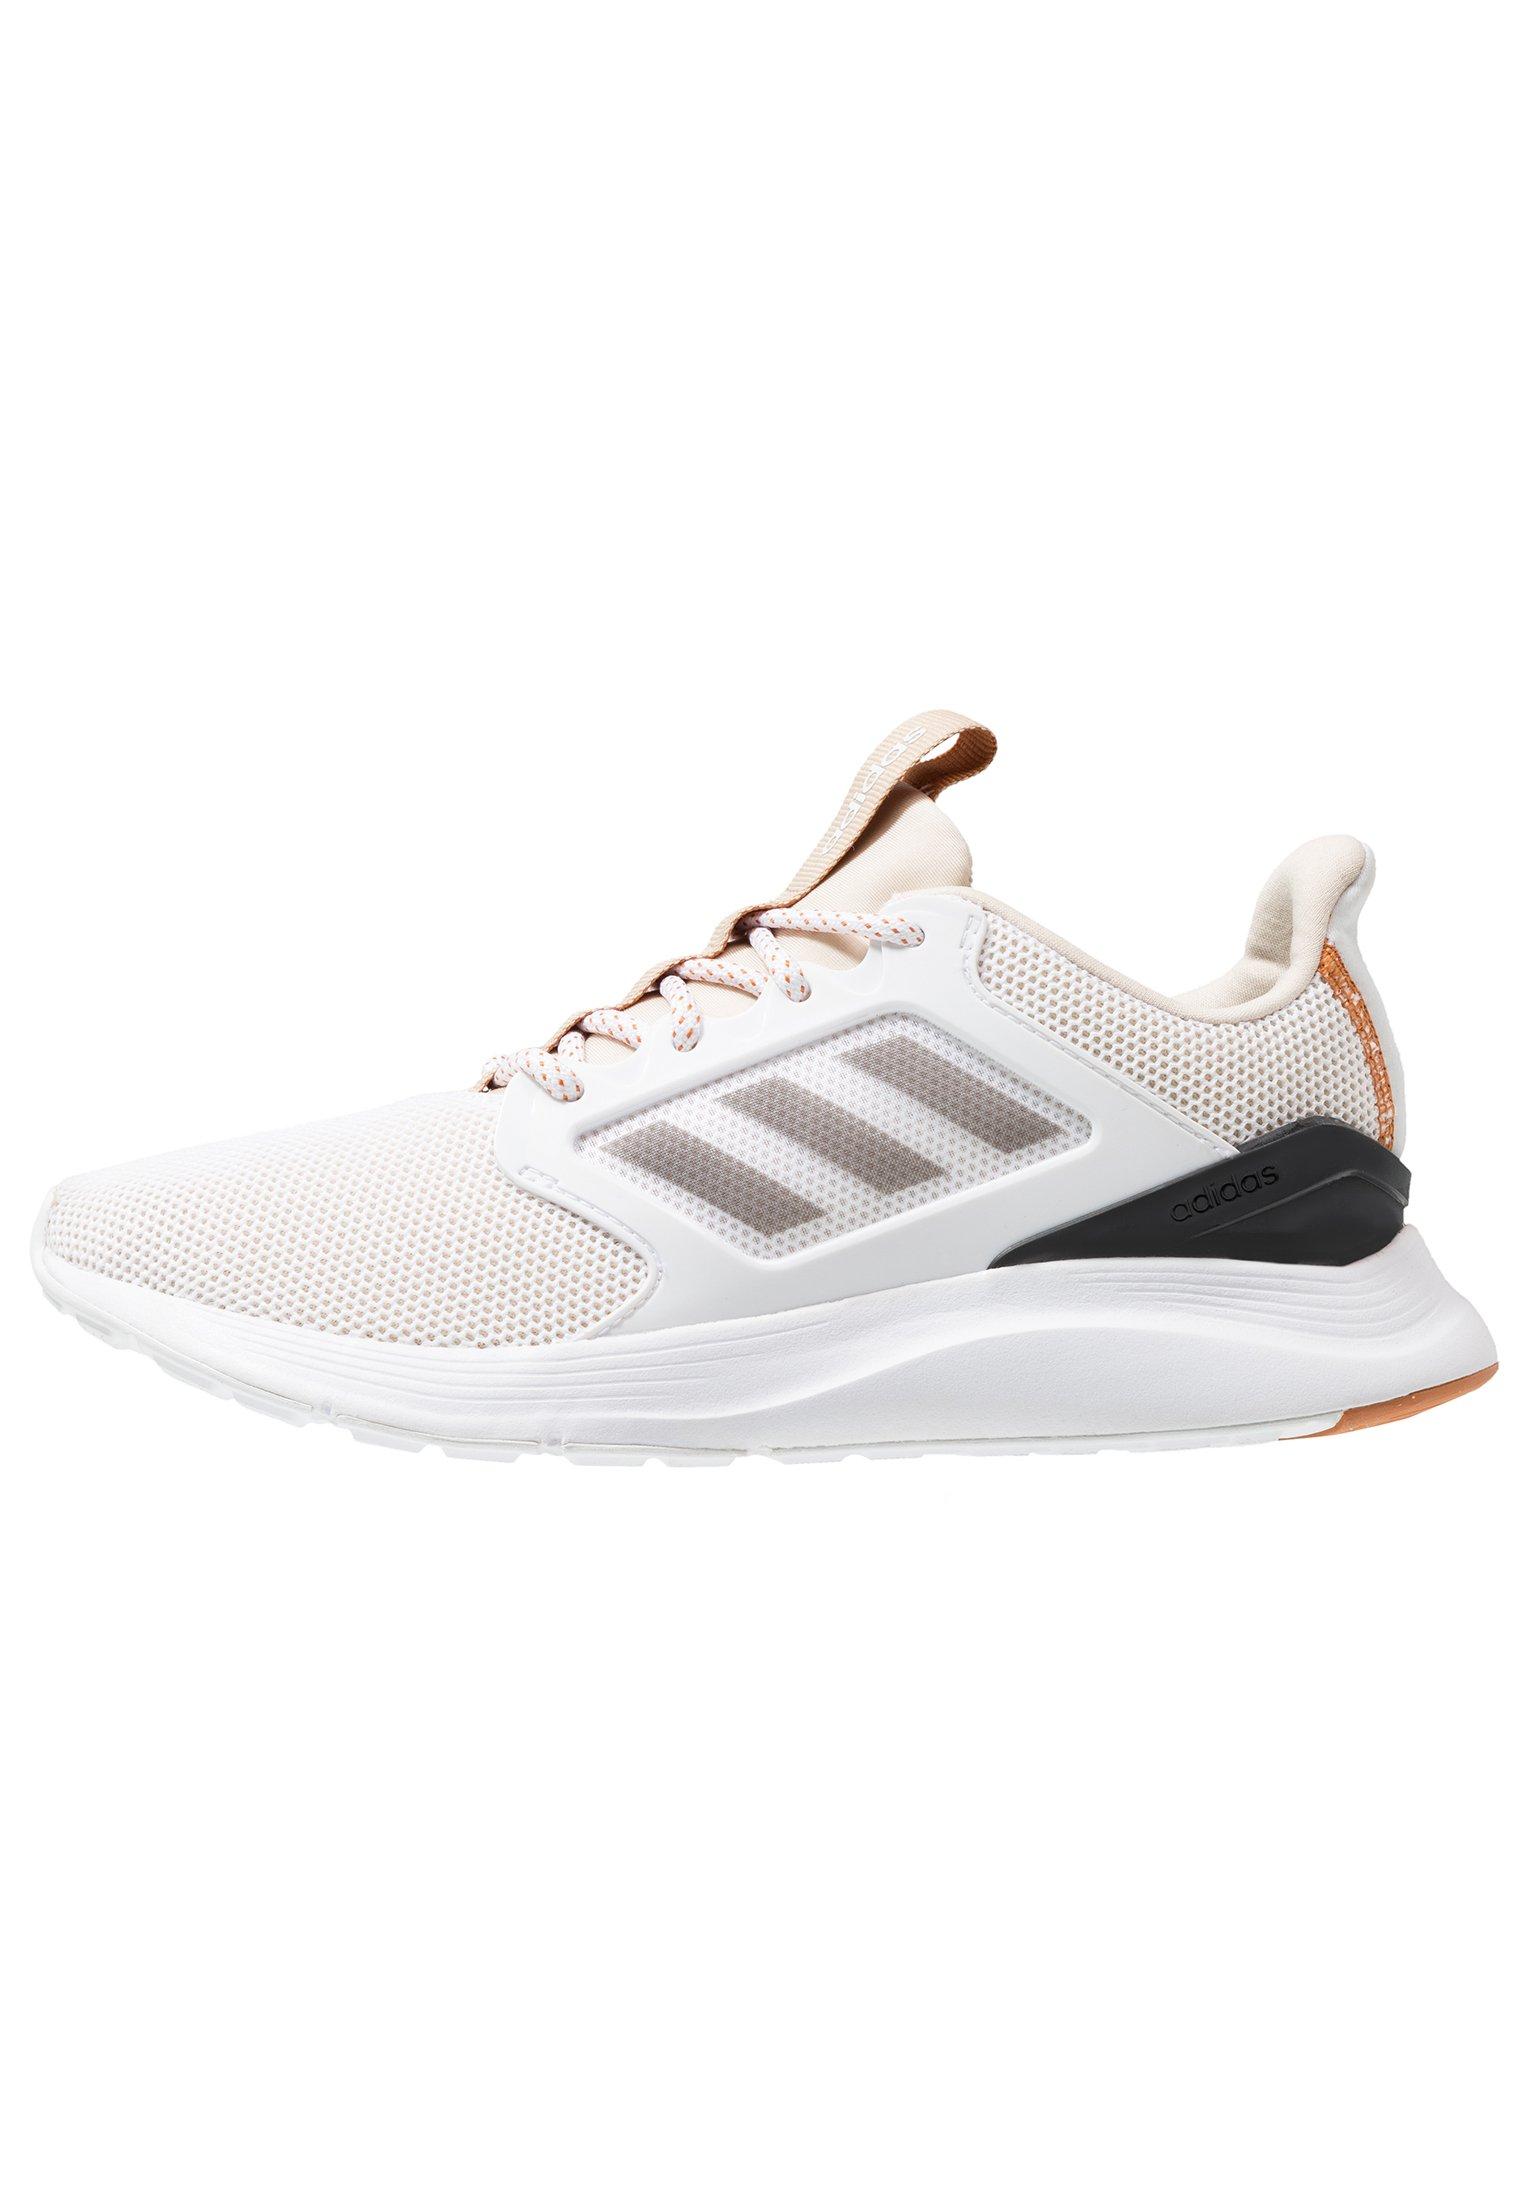 adidas Performance ENERGYFALCON X Chaussures de running